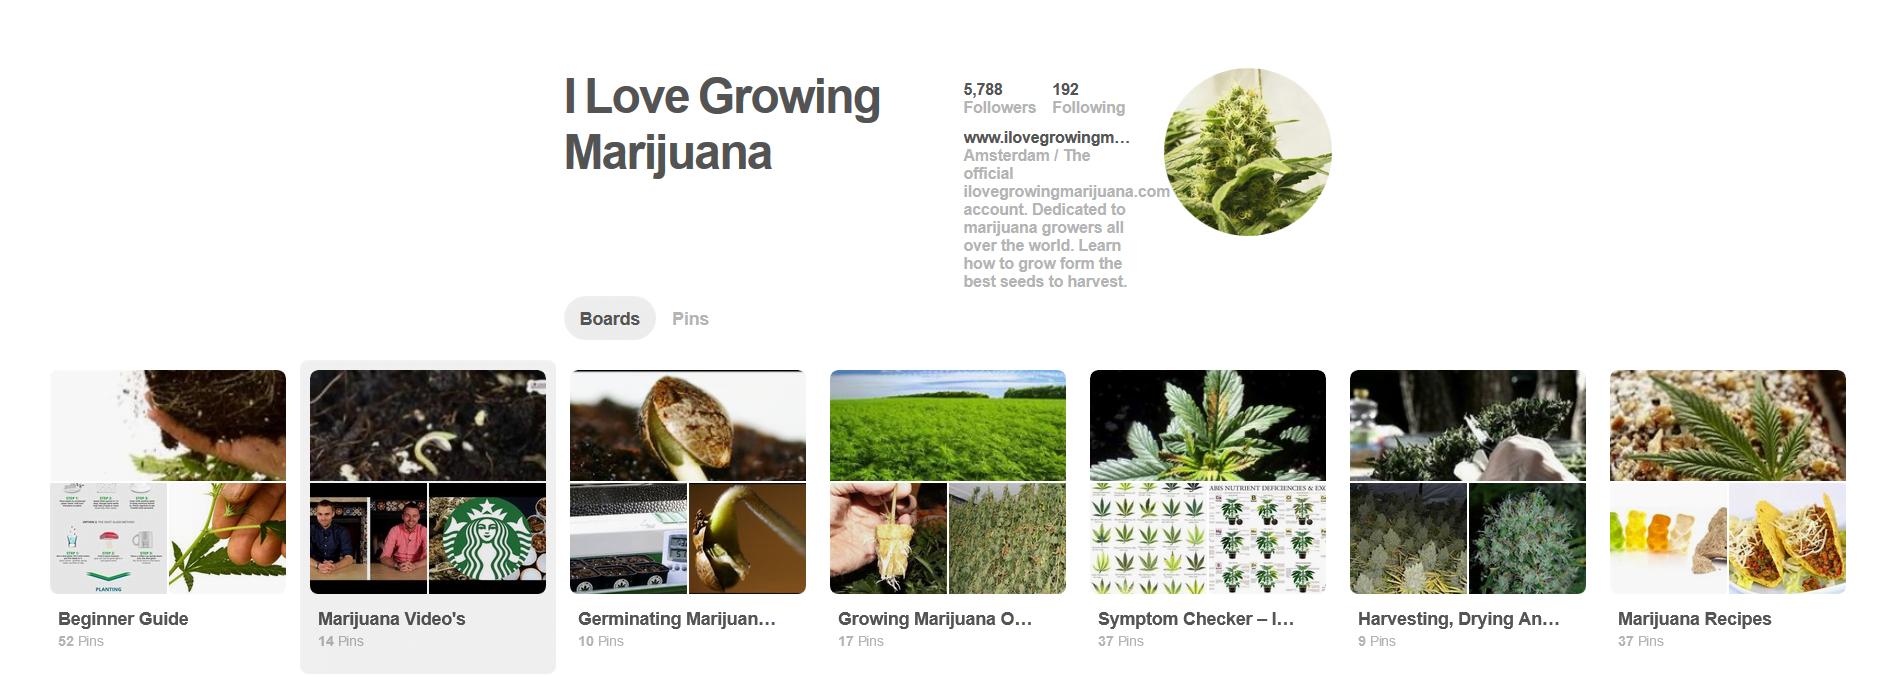 I Love Growing Marijuana Pinterest